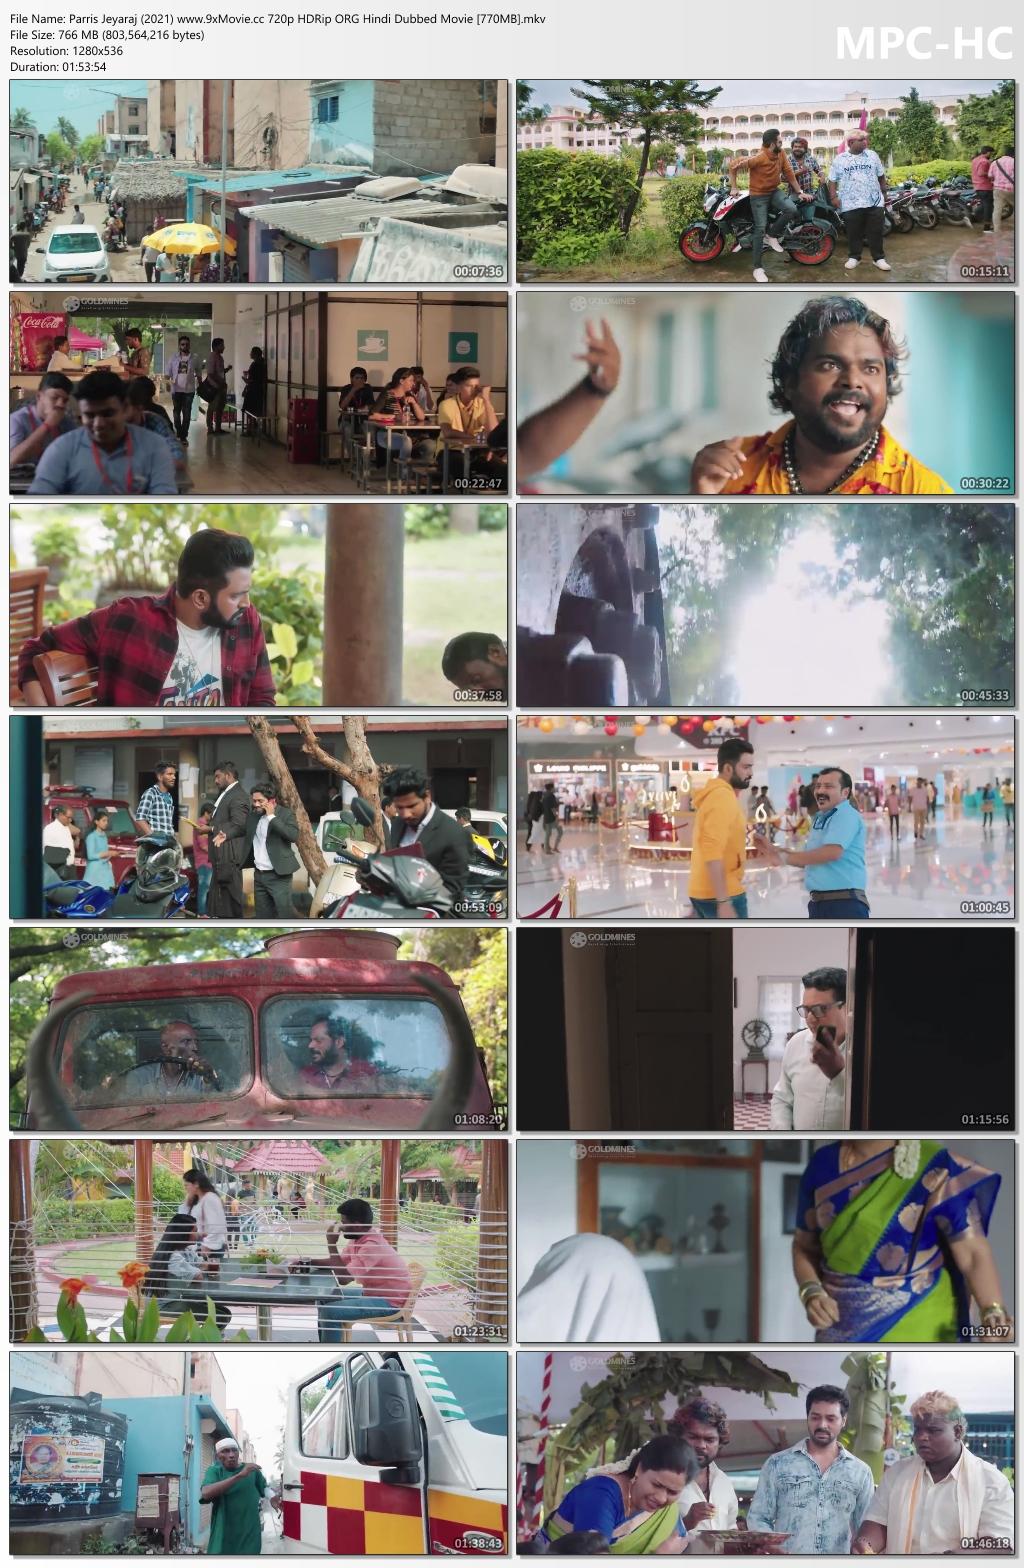 Parris-Jeyaraj-2021-www-9x-Movie-cc-720p-HDRip-ORG-Hindi-Dubbed-Movie-770-MB-mkv